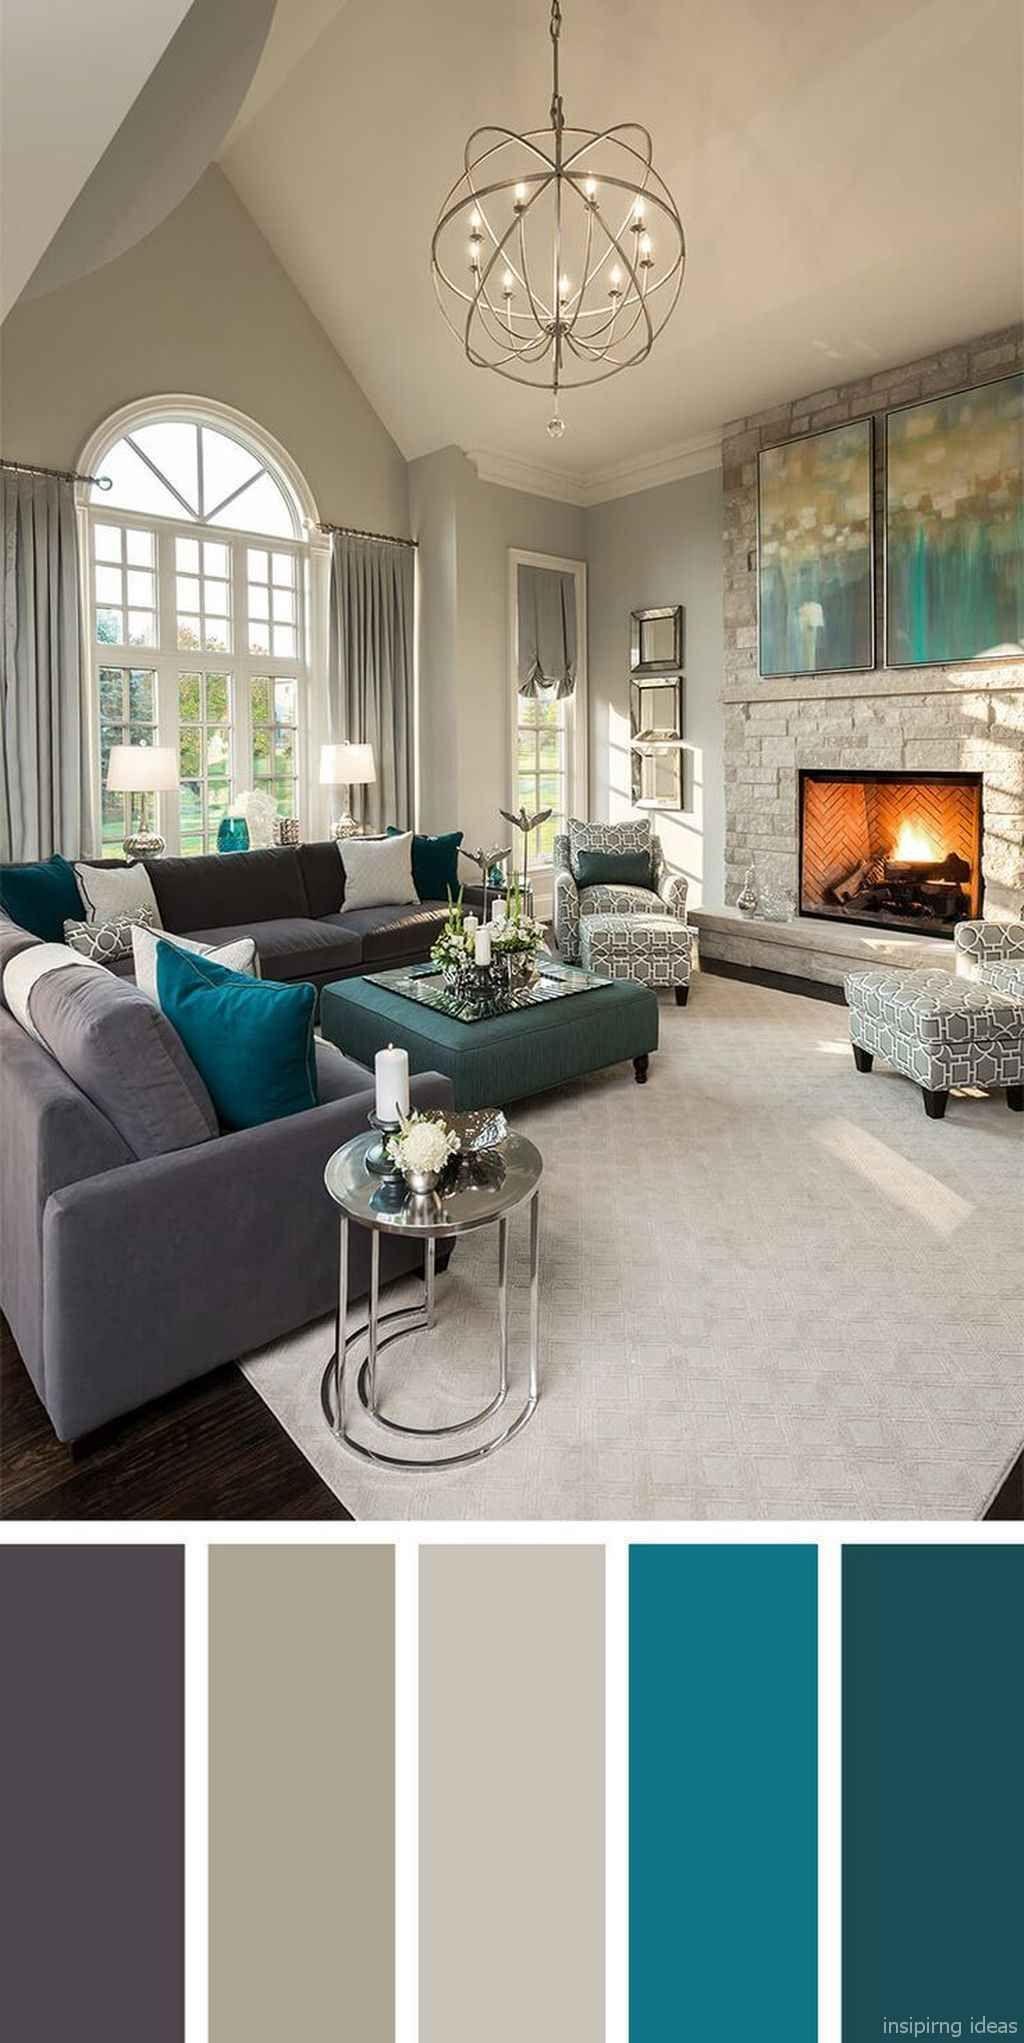 32+ Living room color schemes 2020 ideas